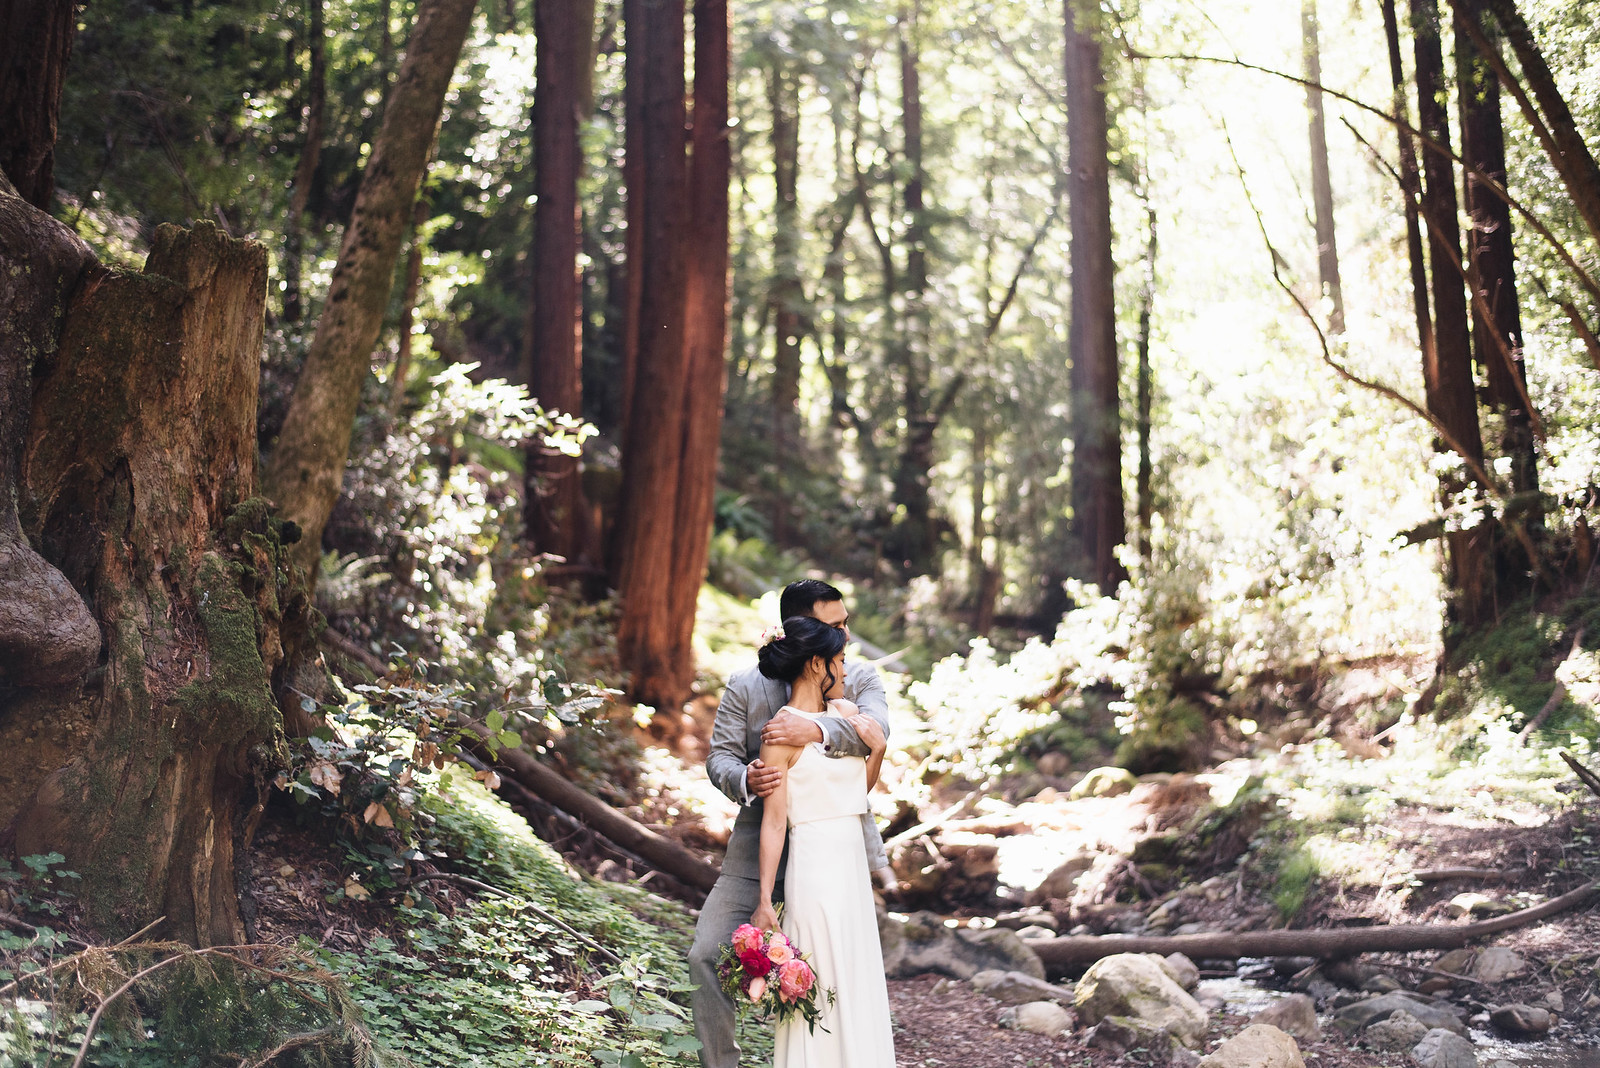 Saratoga Springs Wedding Northern California Photographer on juliettelaura.blogspot.com